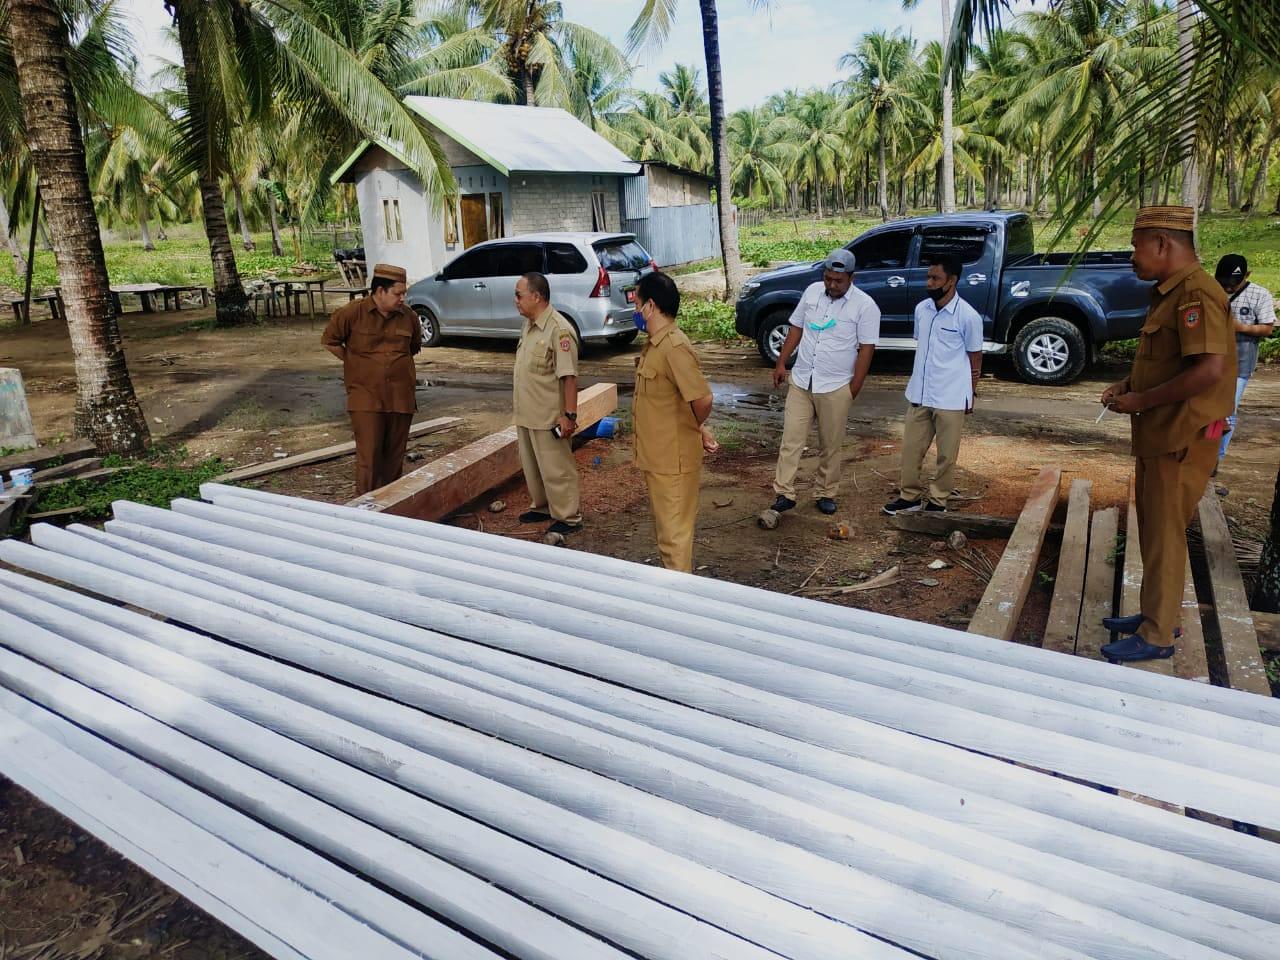 Kepala DKP Gorontalo Utara Cek Kualitas Material Pembuatan Kapal